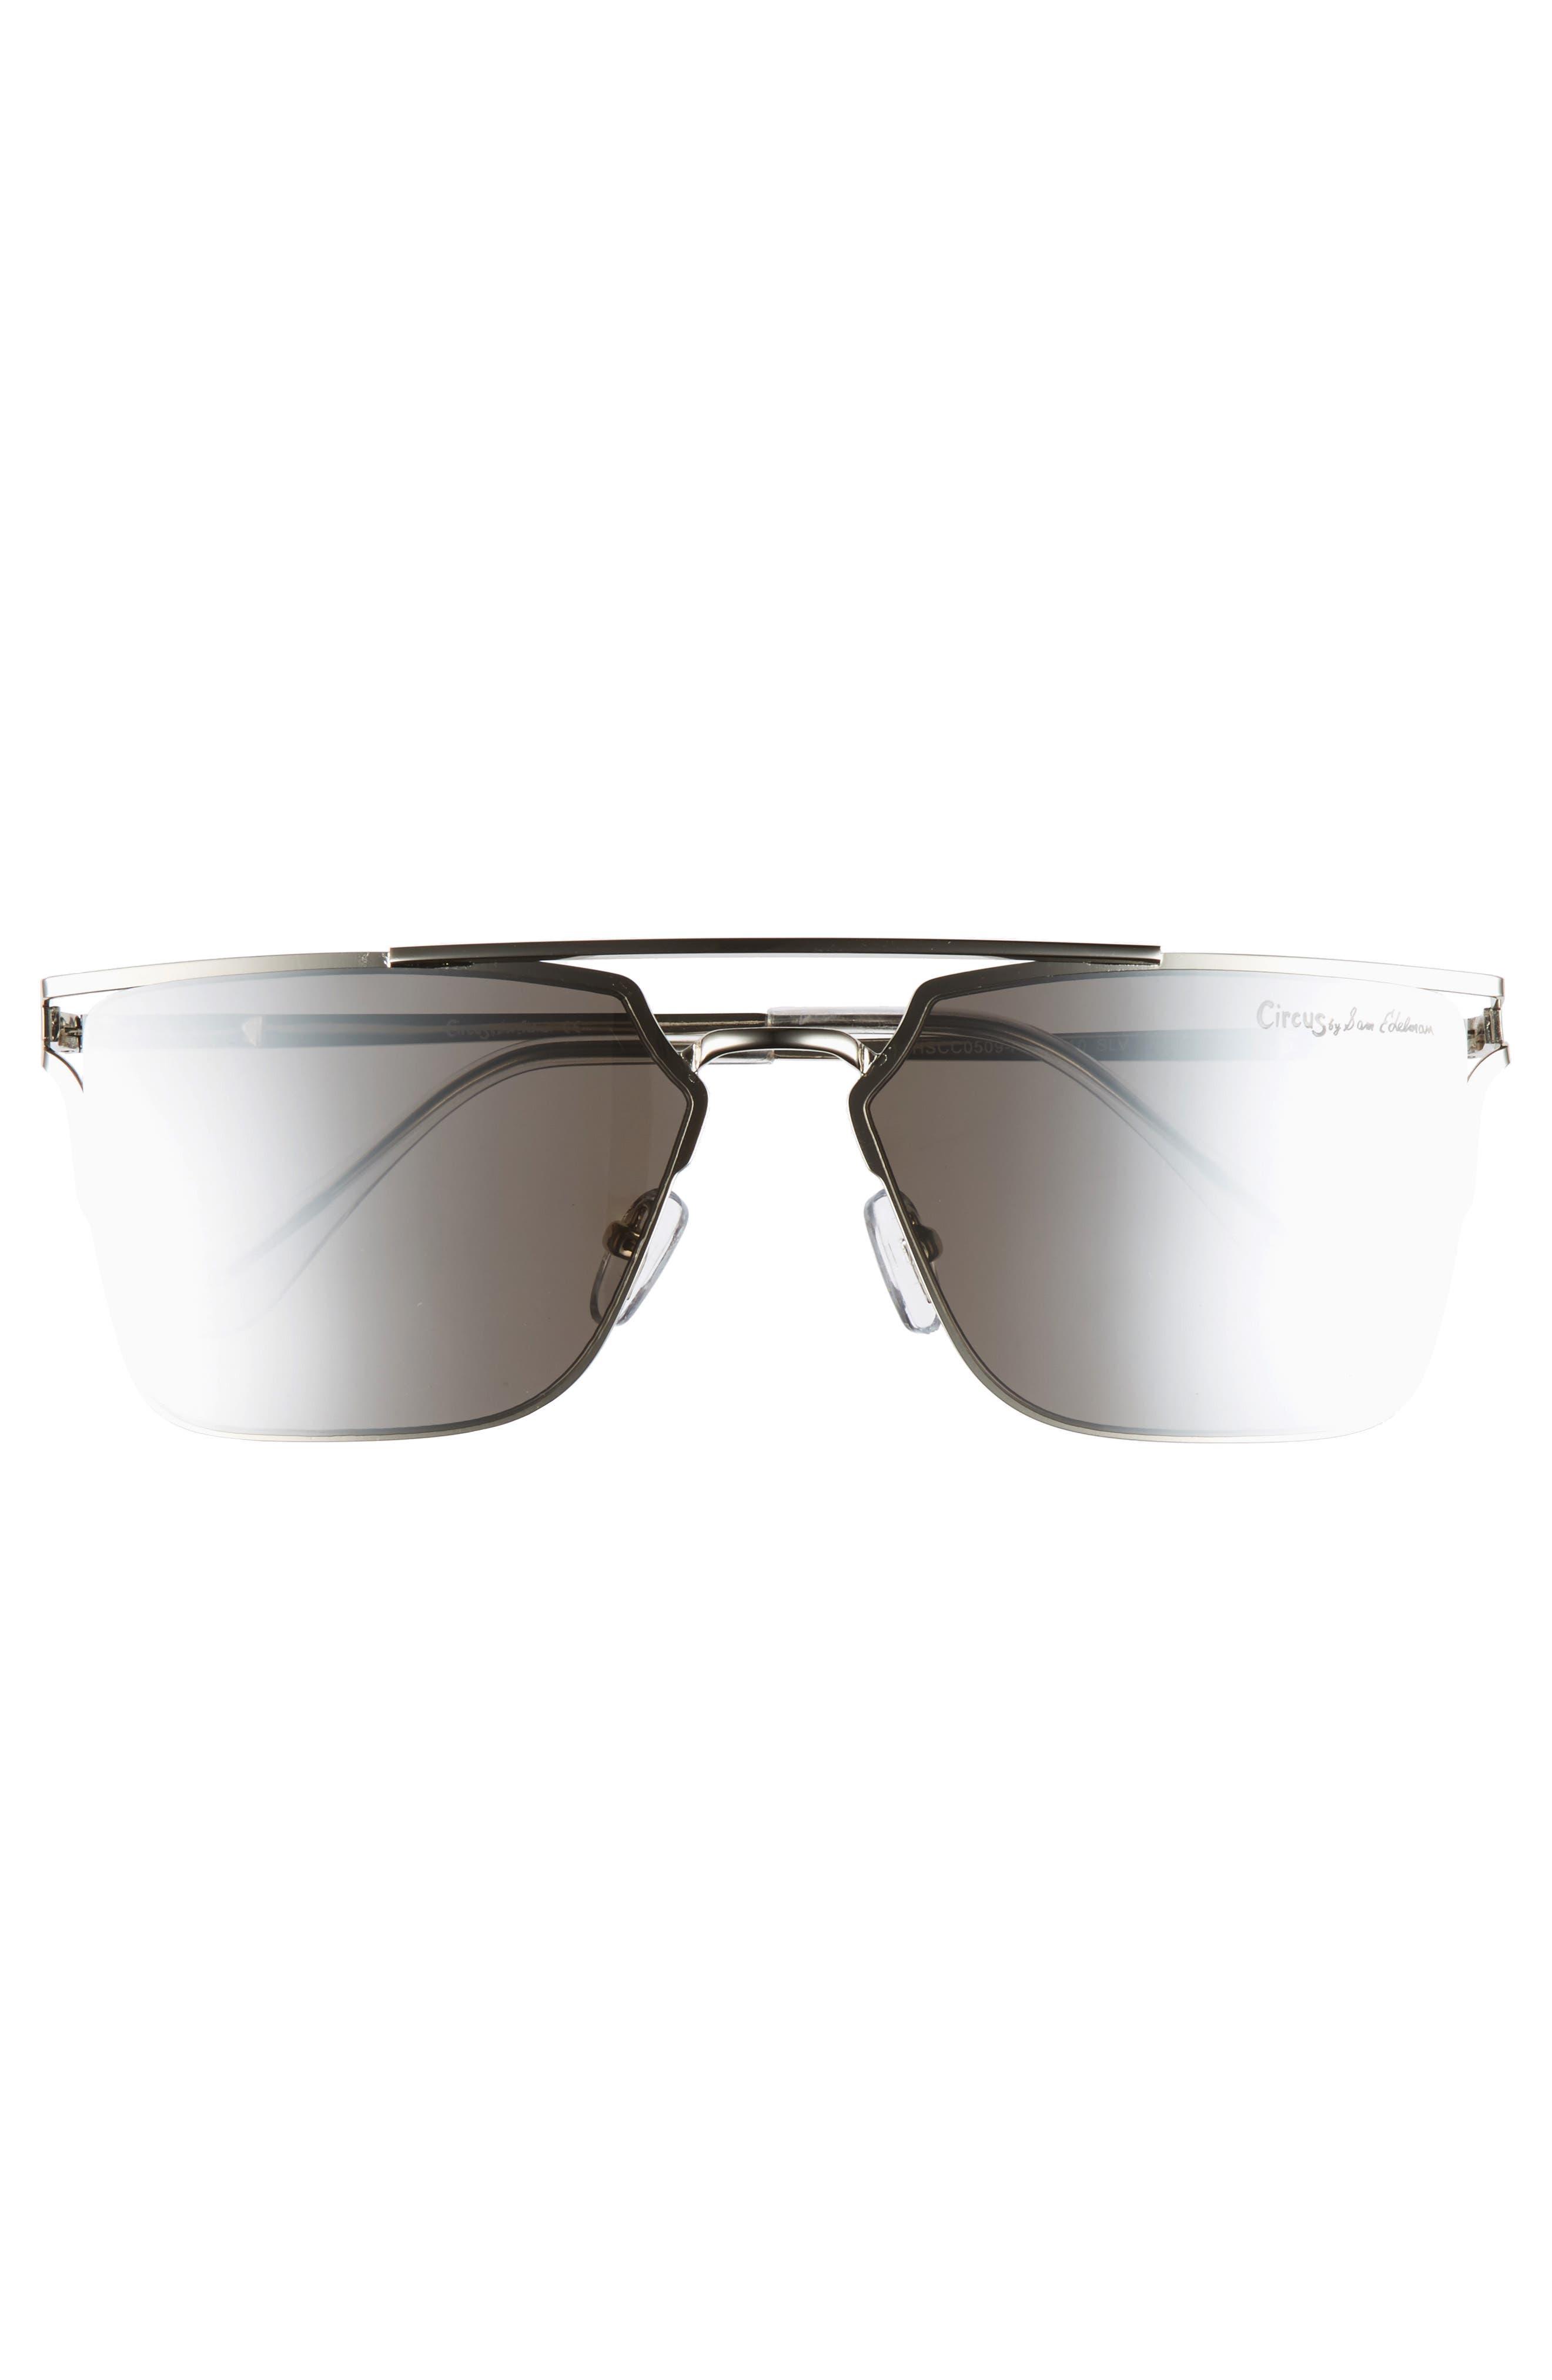 56mm Flat Top Sunglasses,                             Alternate thumbnail 8, color,